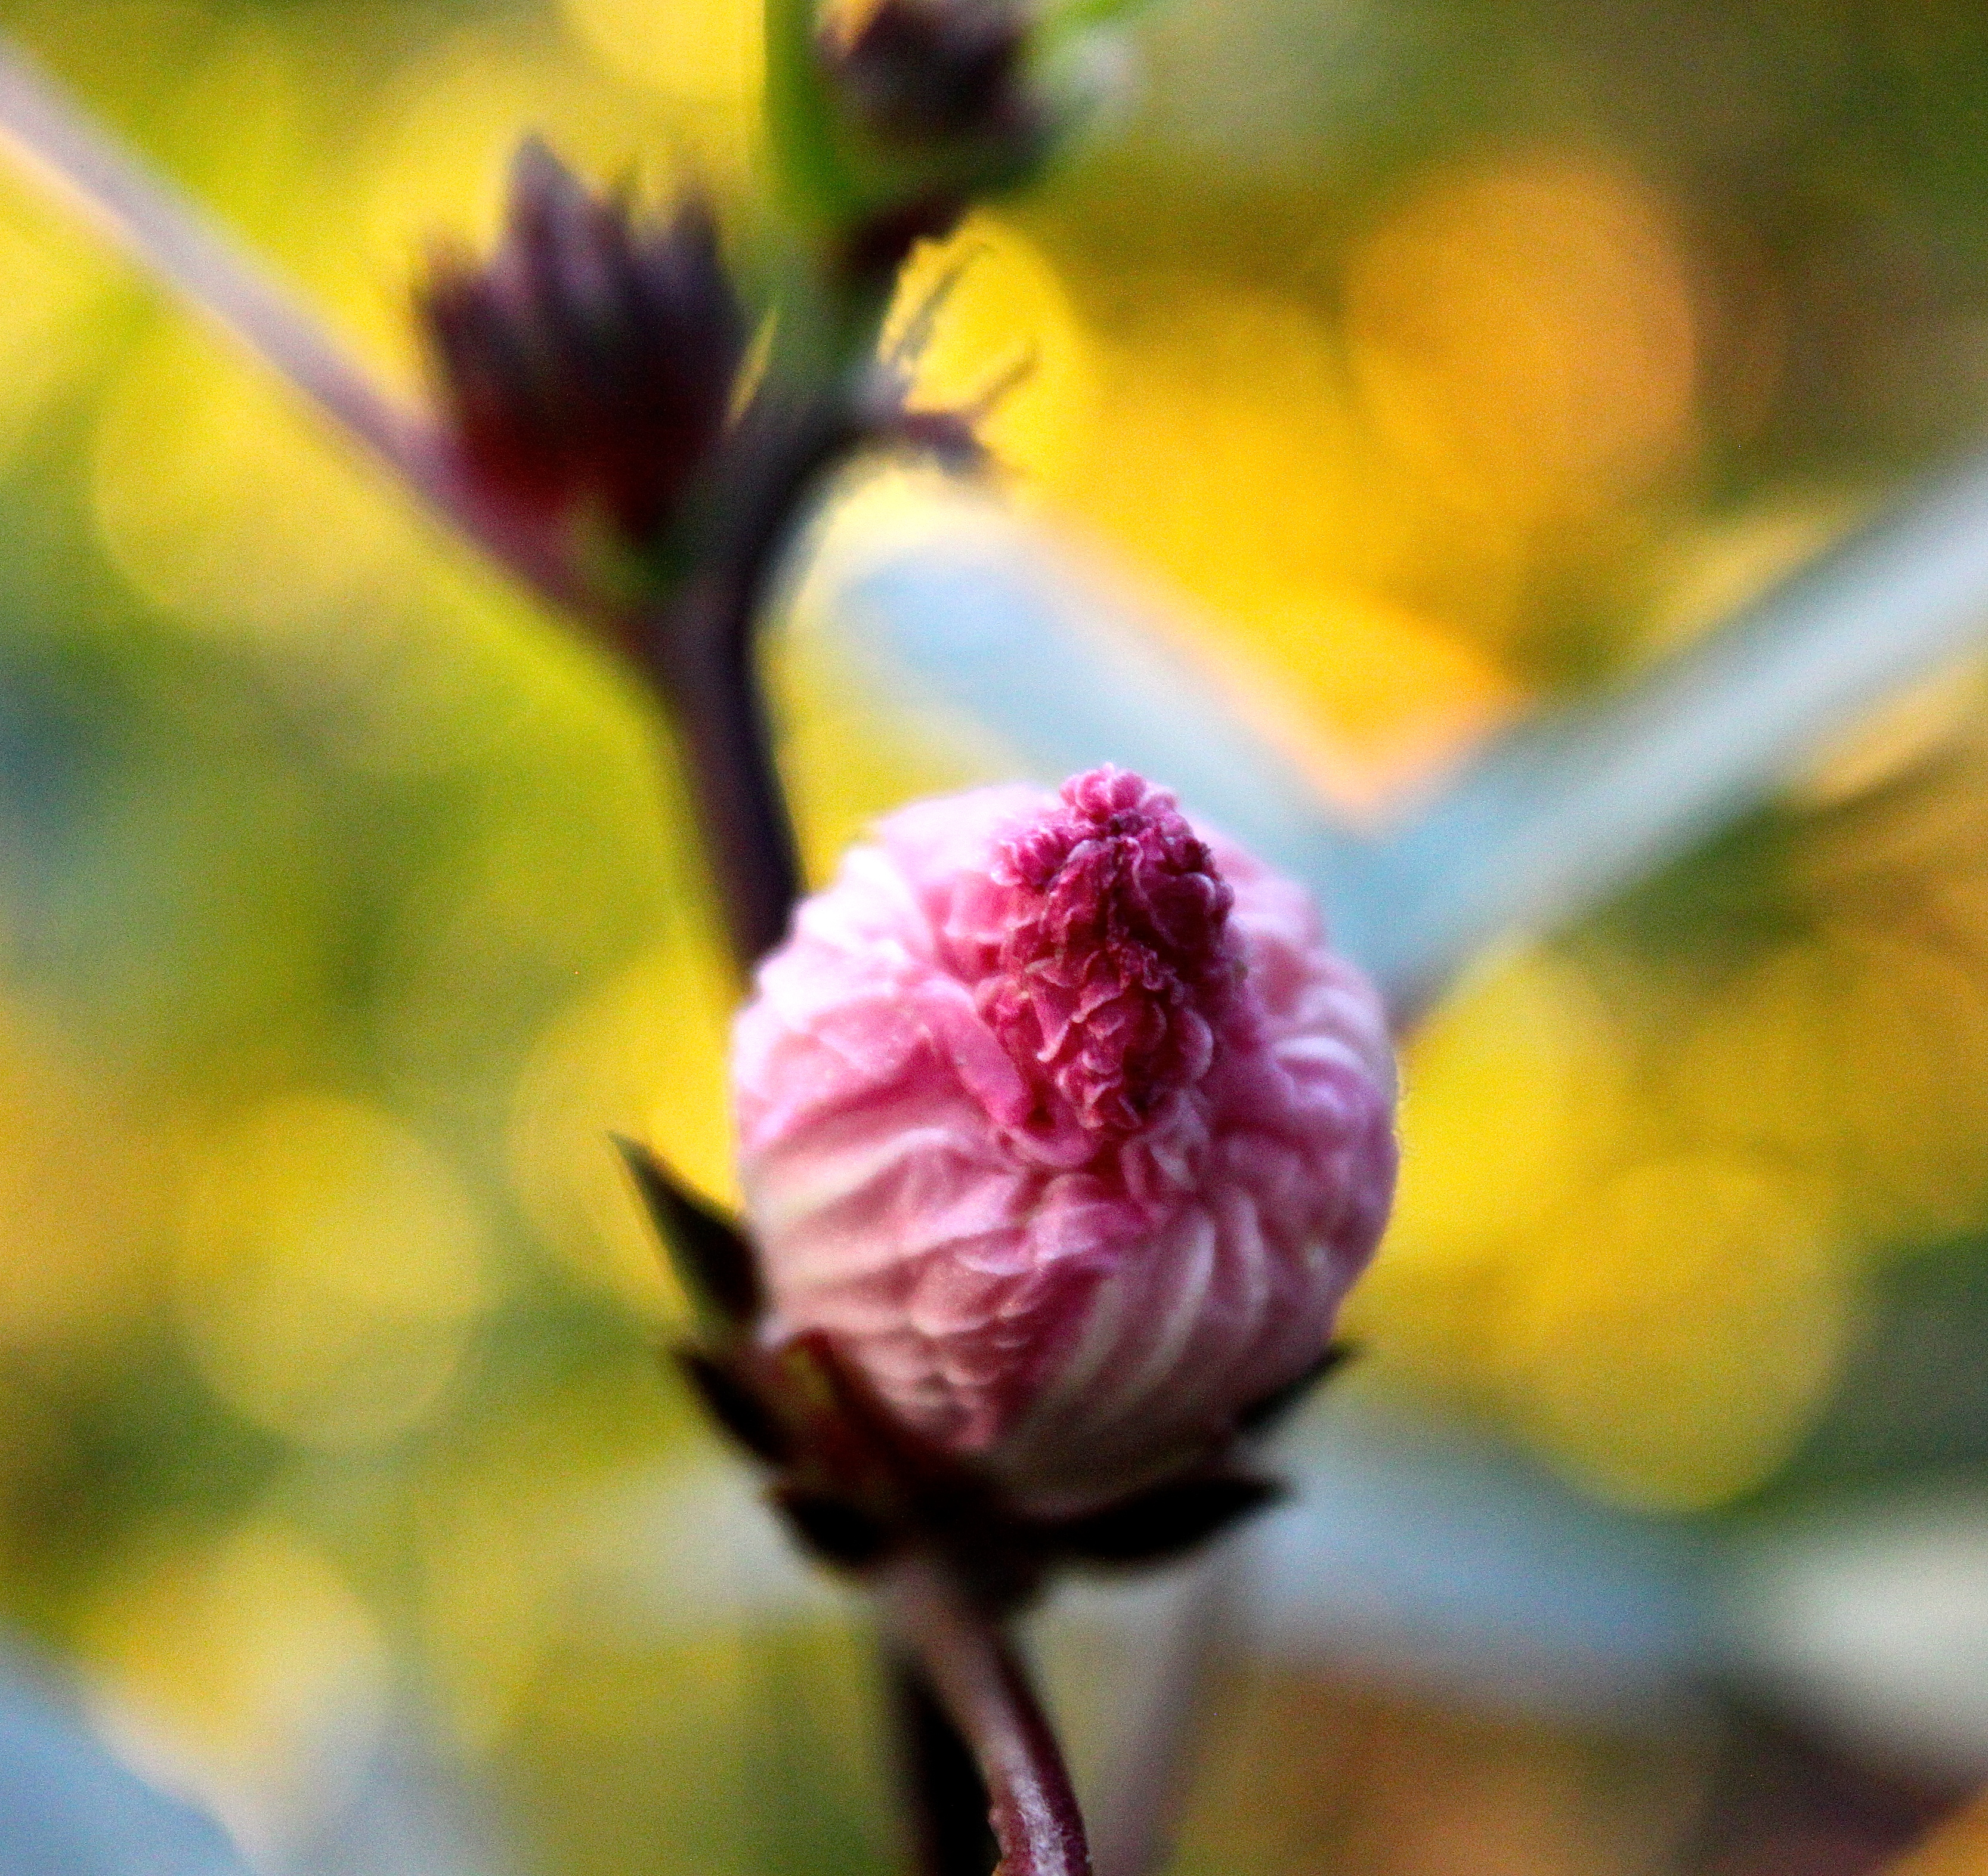 An emerging rosella flower.